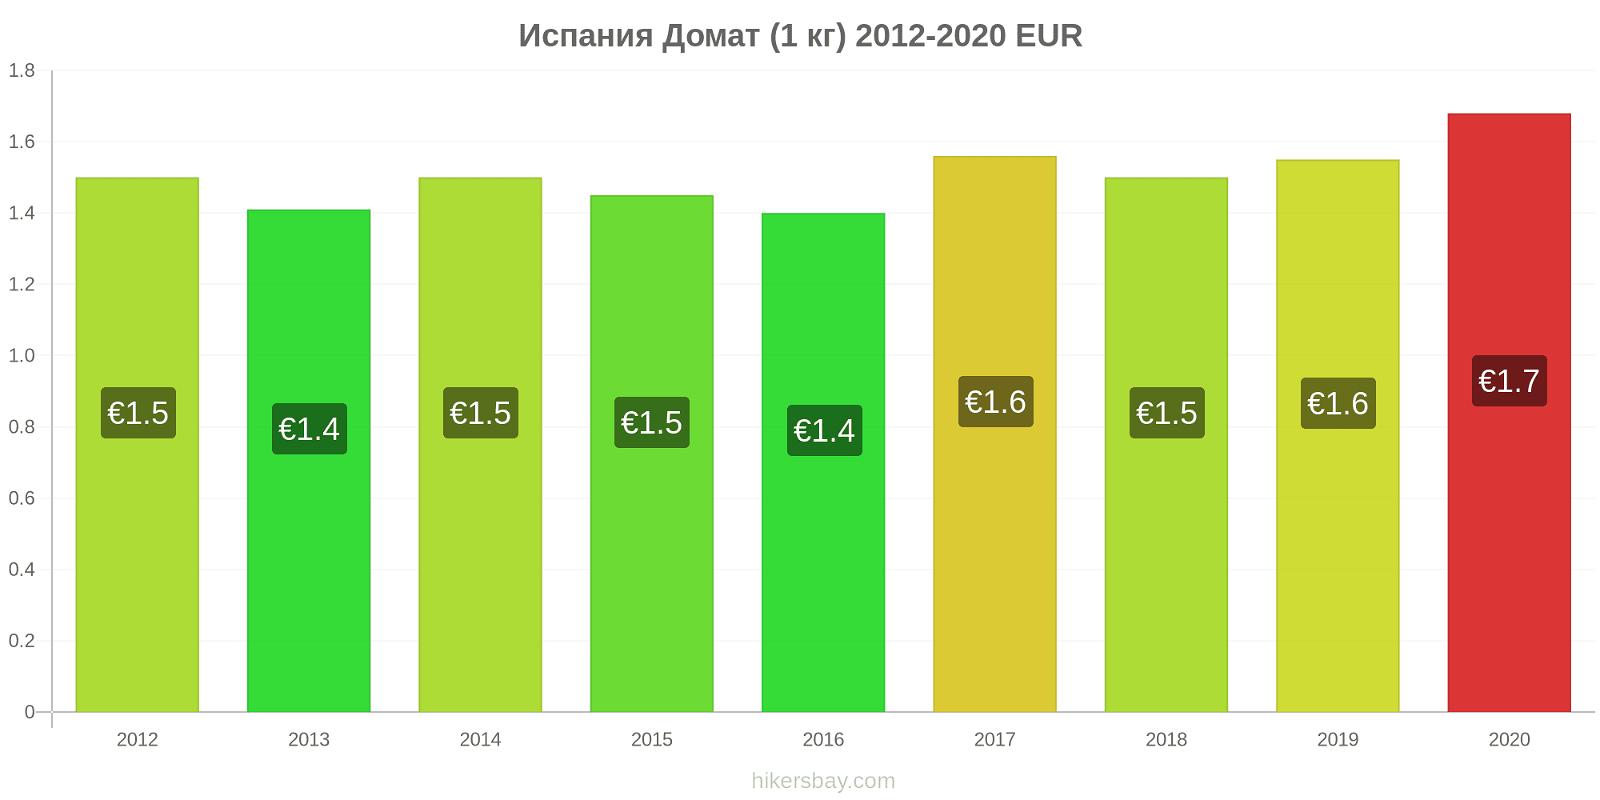 Испания ценови промени Домат (1 кг) hikersbay.com